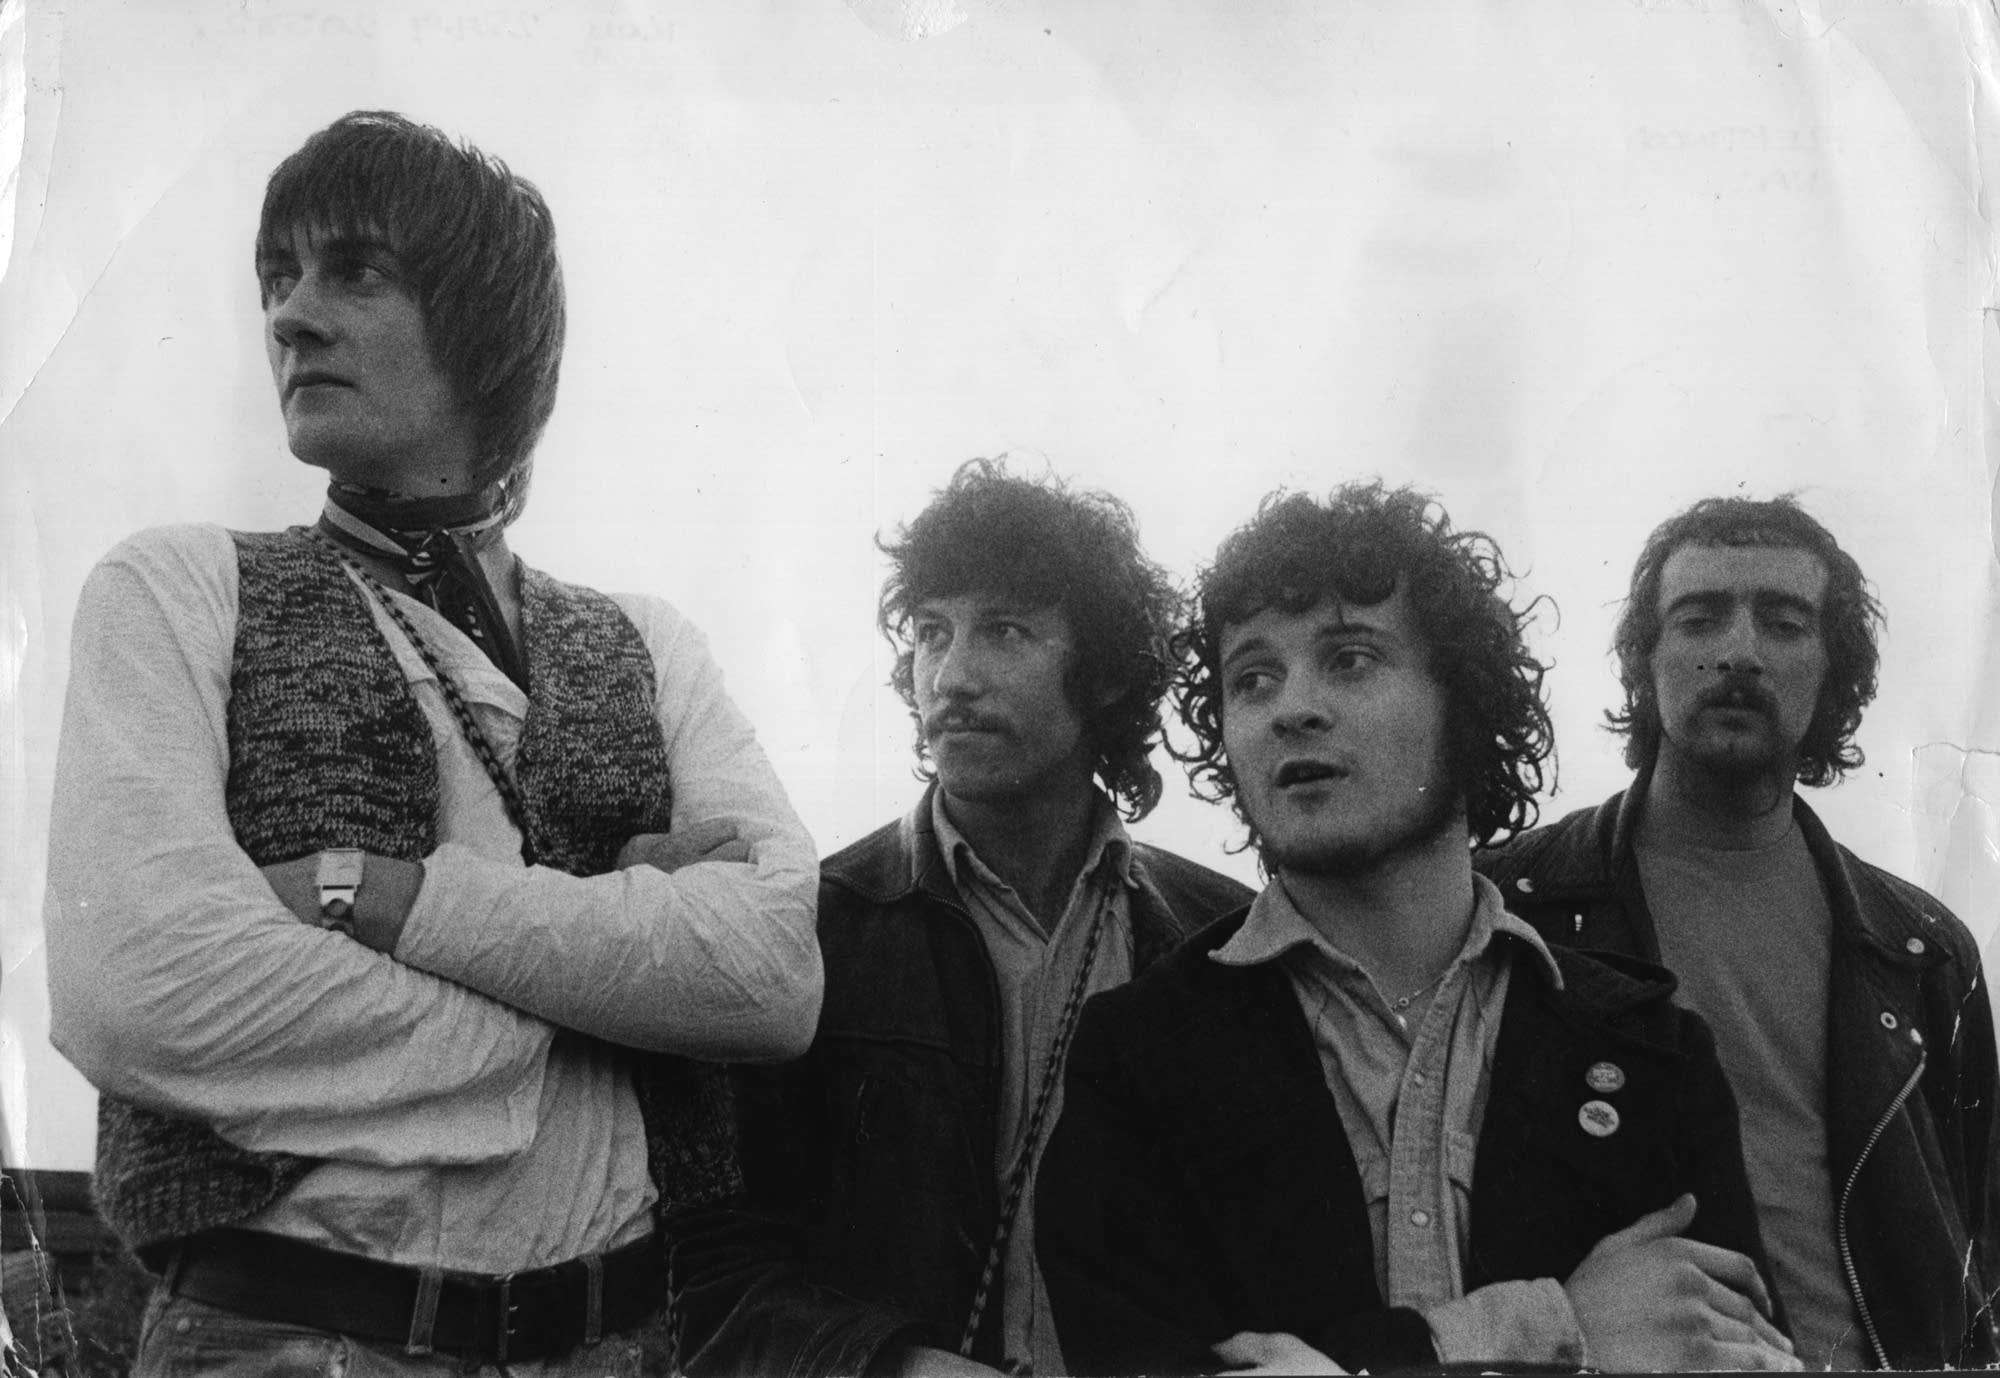 Peter Green, Fleetwood Mac co-founder